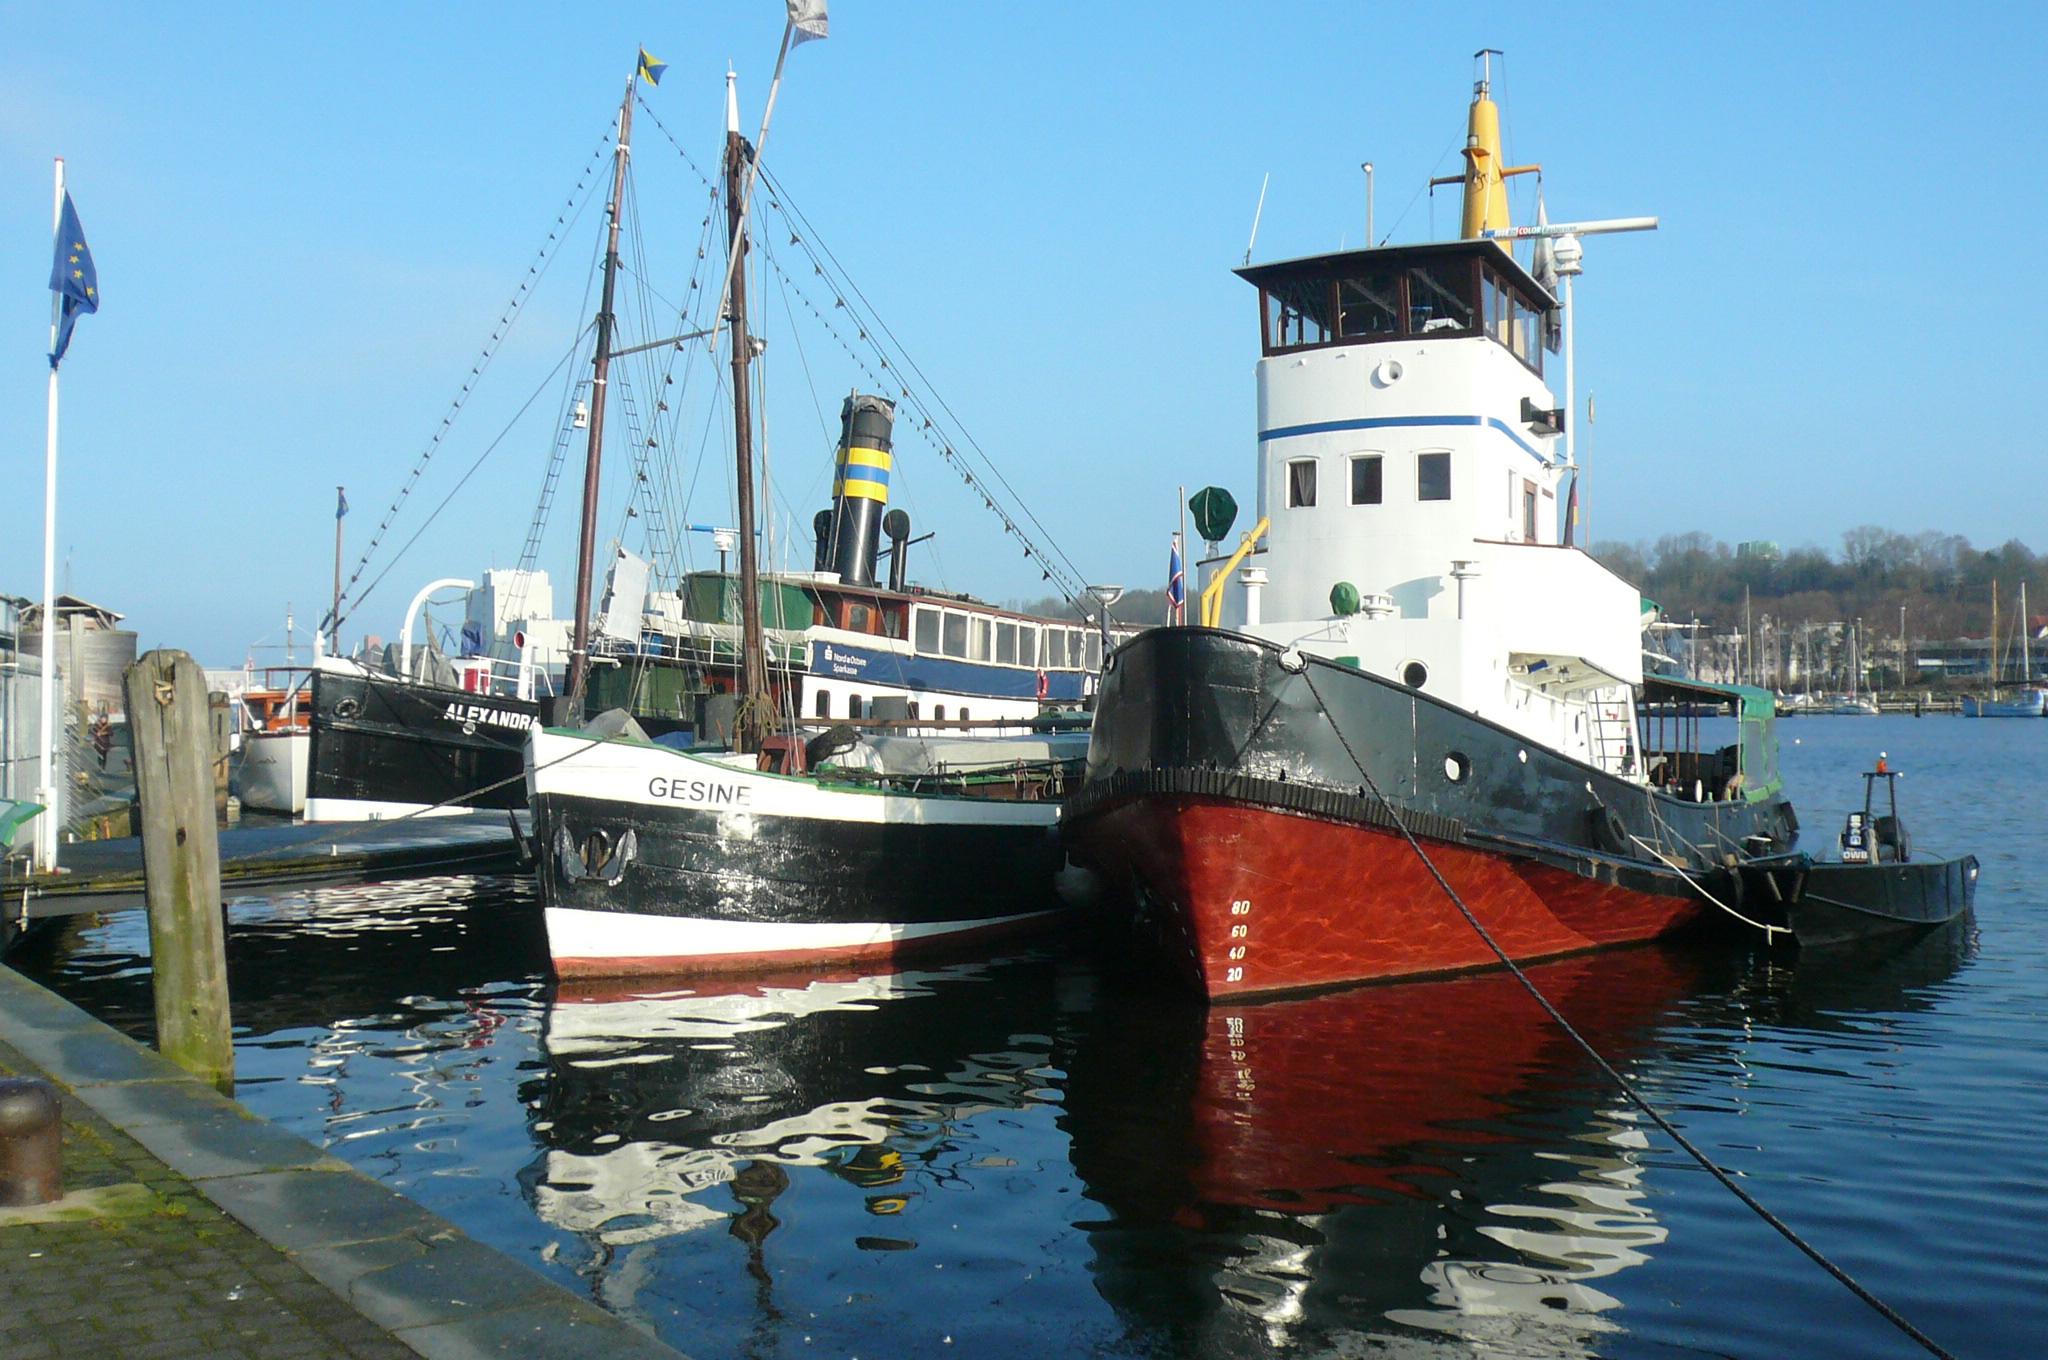 Schlepper Flensburg012015 014